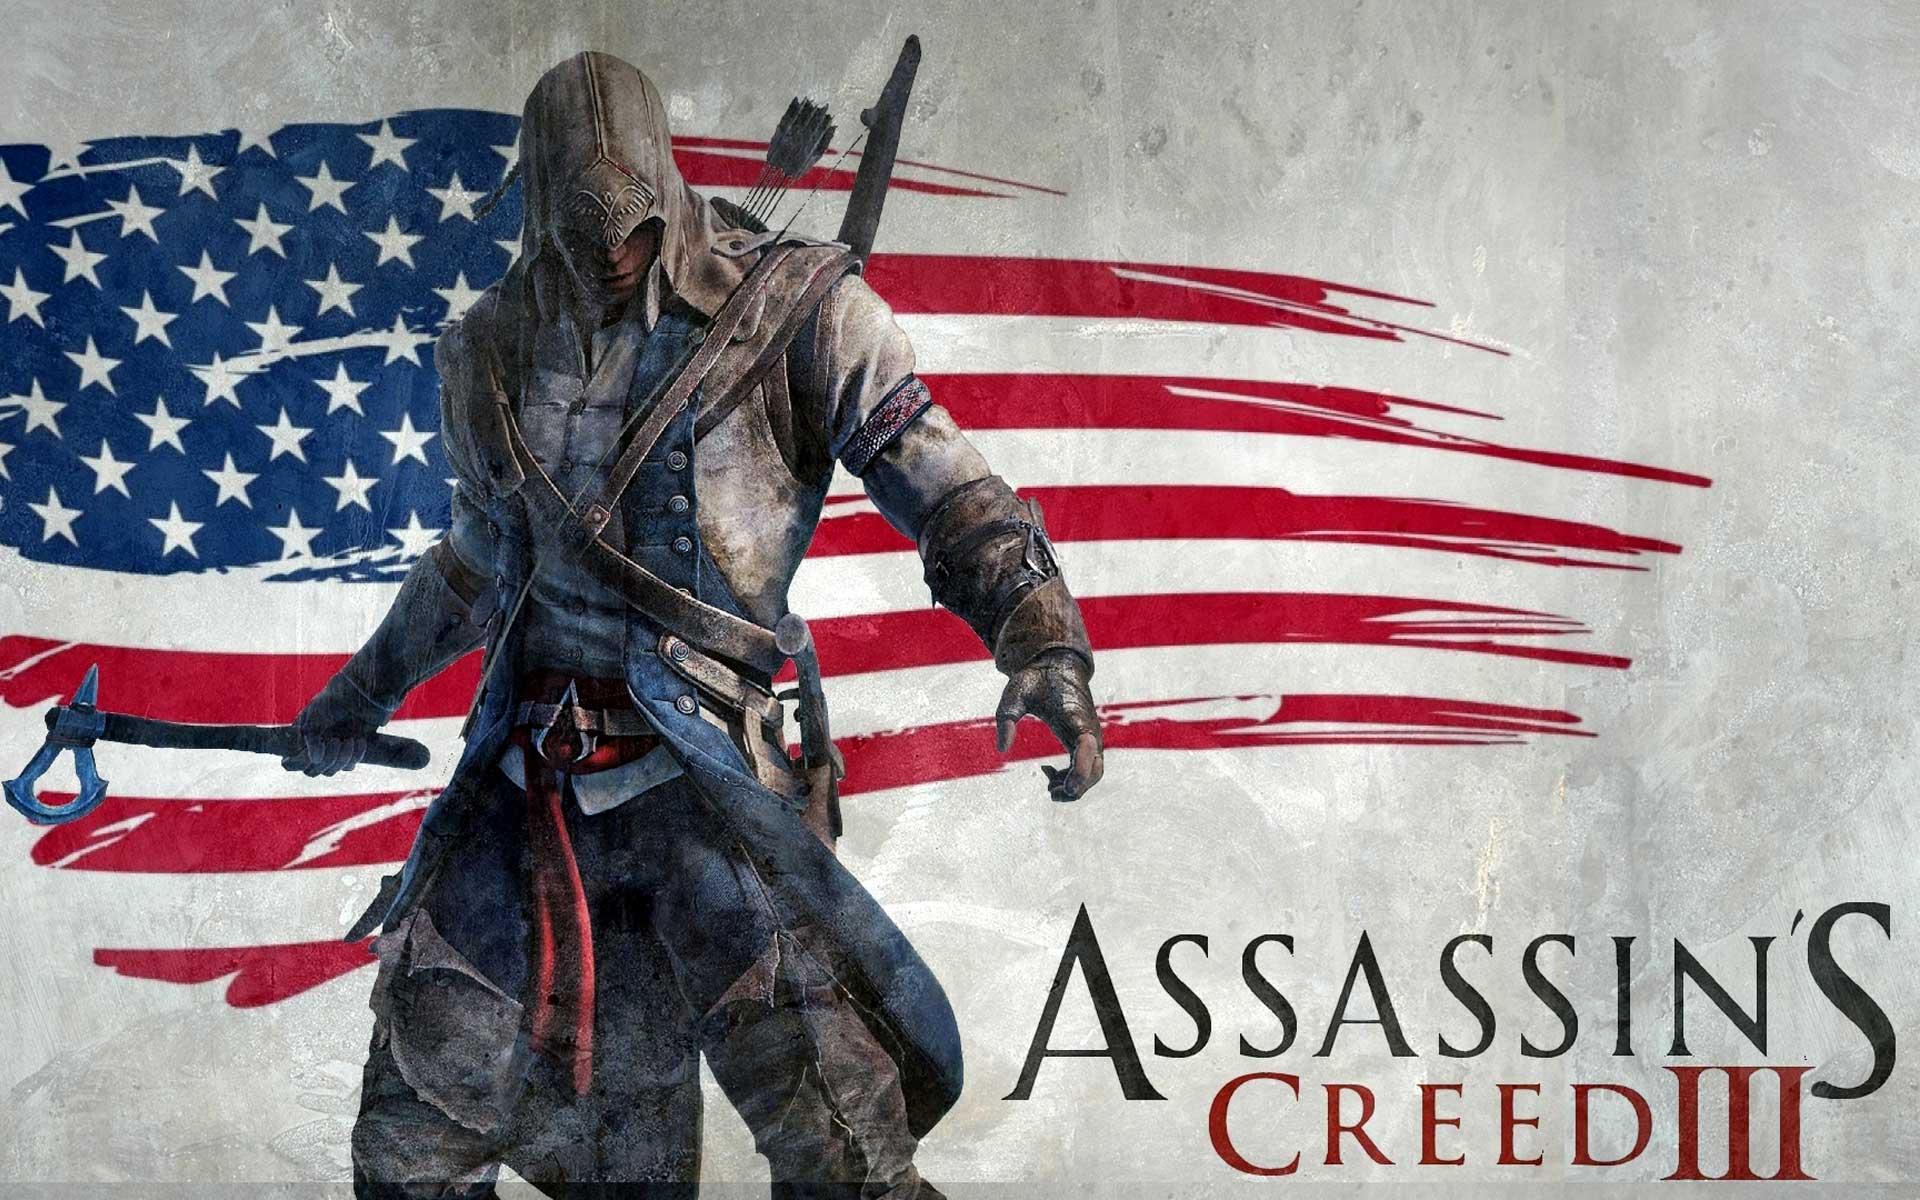 Assassins Creed III Wallpaper   Rebel Gaming 1920x1200